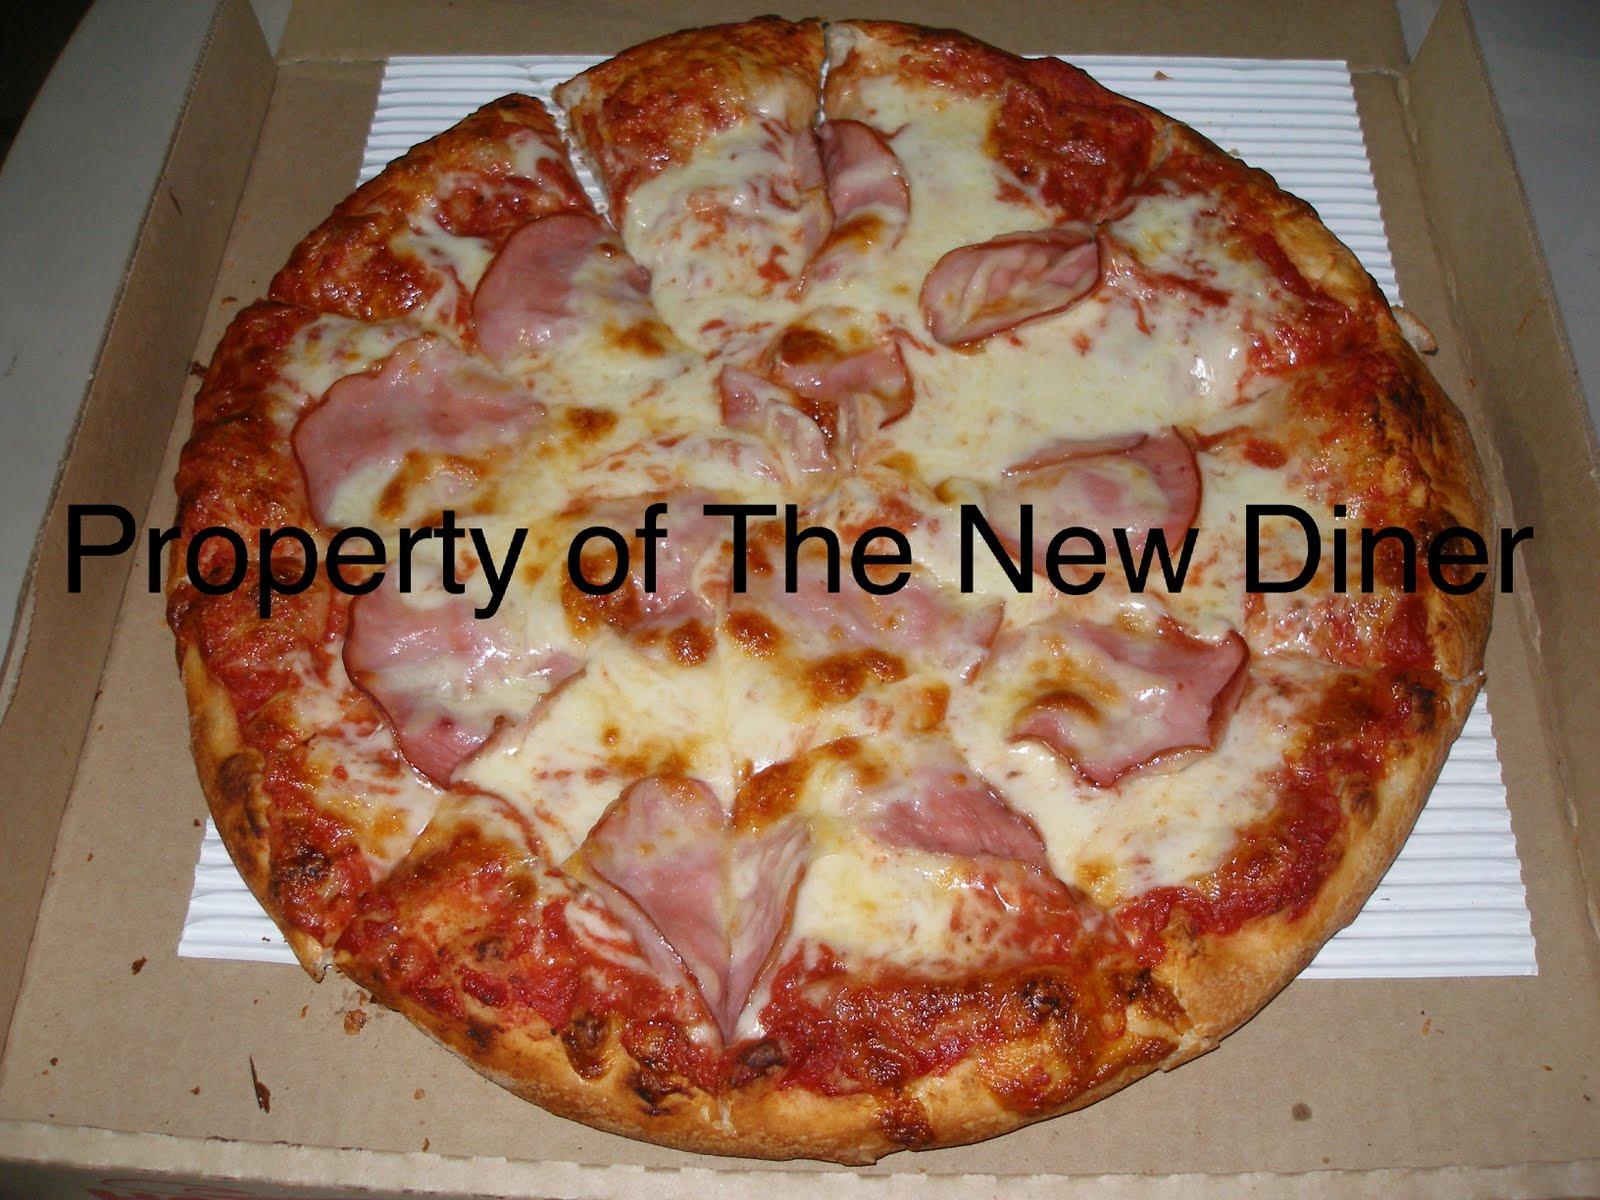 World S Best Pizza 3142 Colima Rd Hacienda Heights 626 968 4794